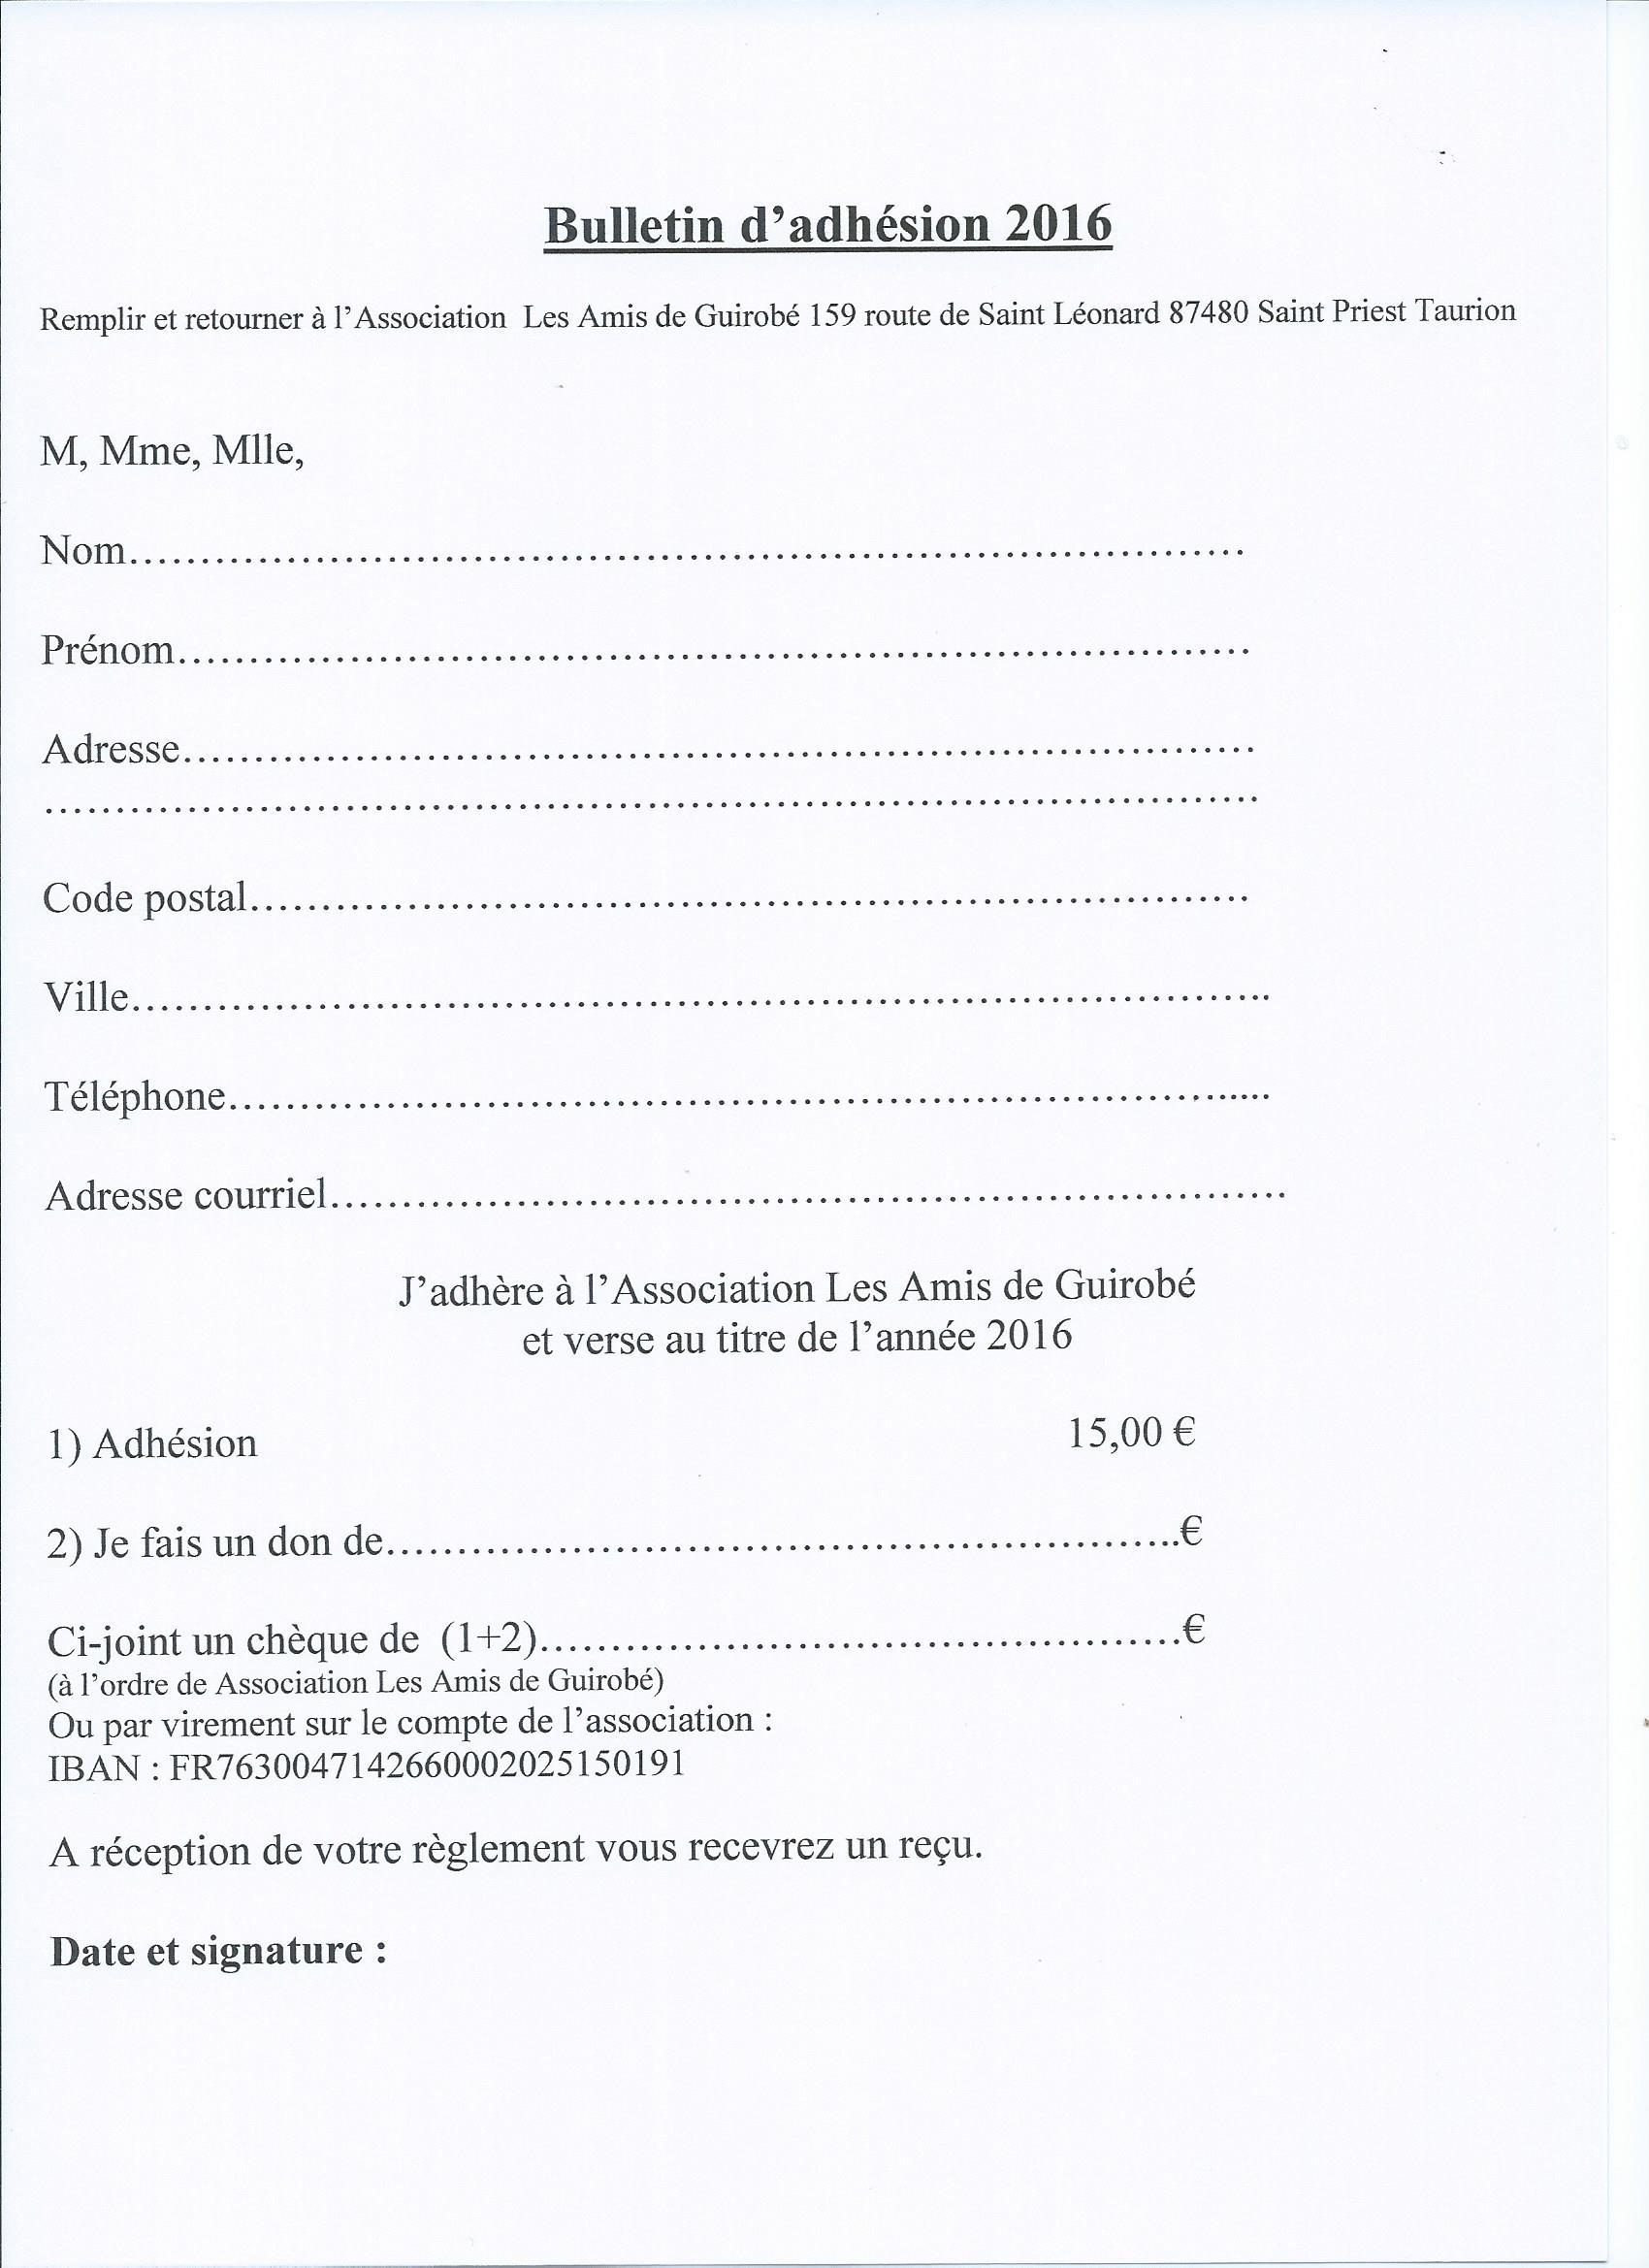 Bulletin Adhésion 2016 Photo.jpg